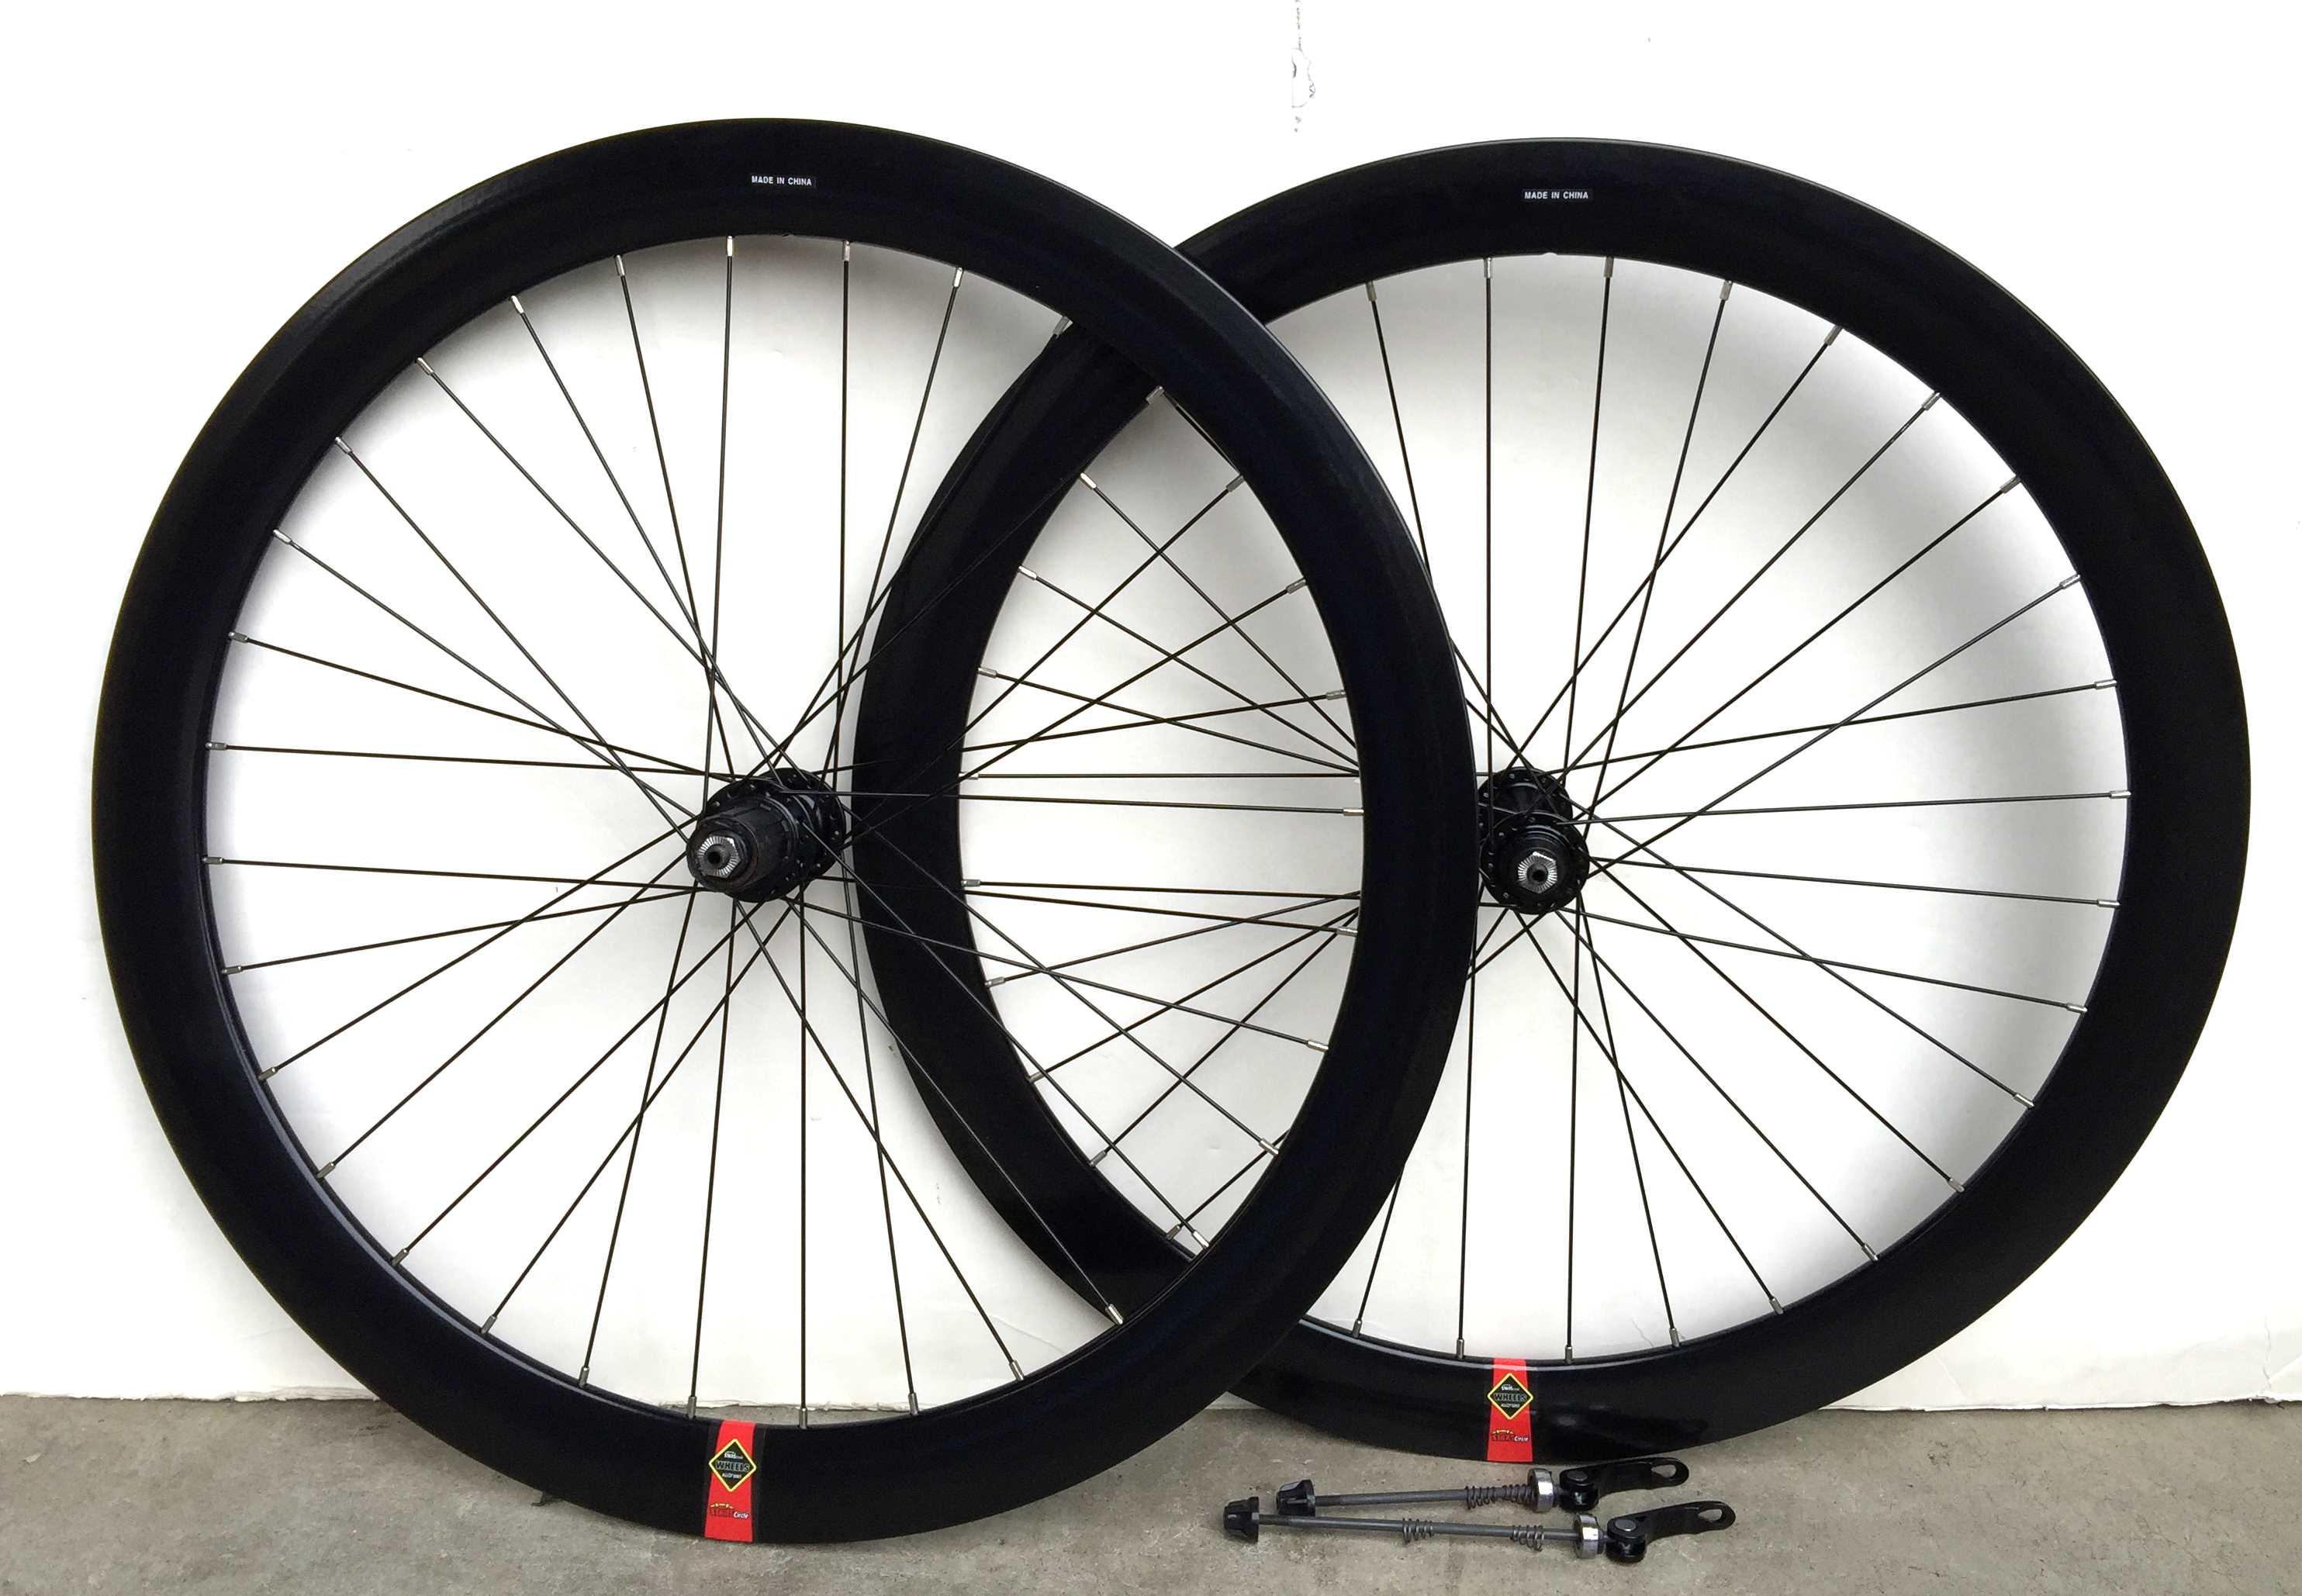 10 Speed Bike Rims : Stars road bike c deep mm speed shimano